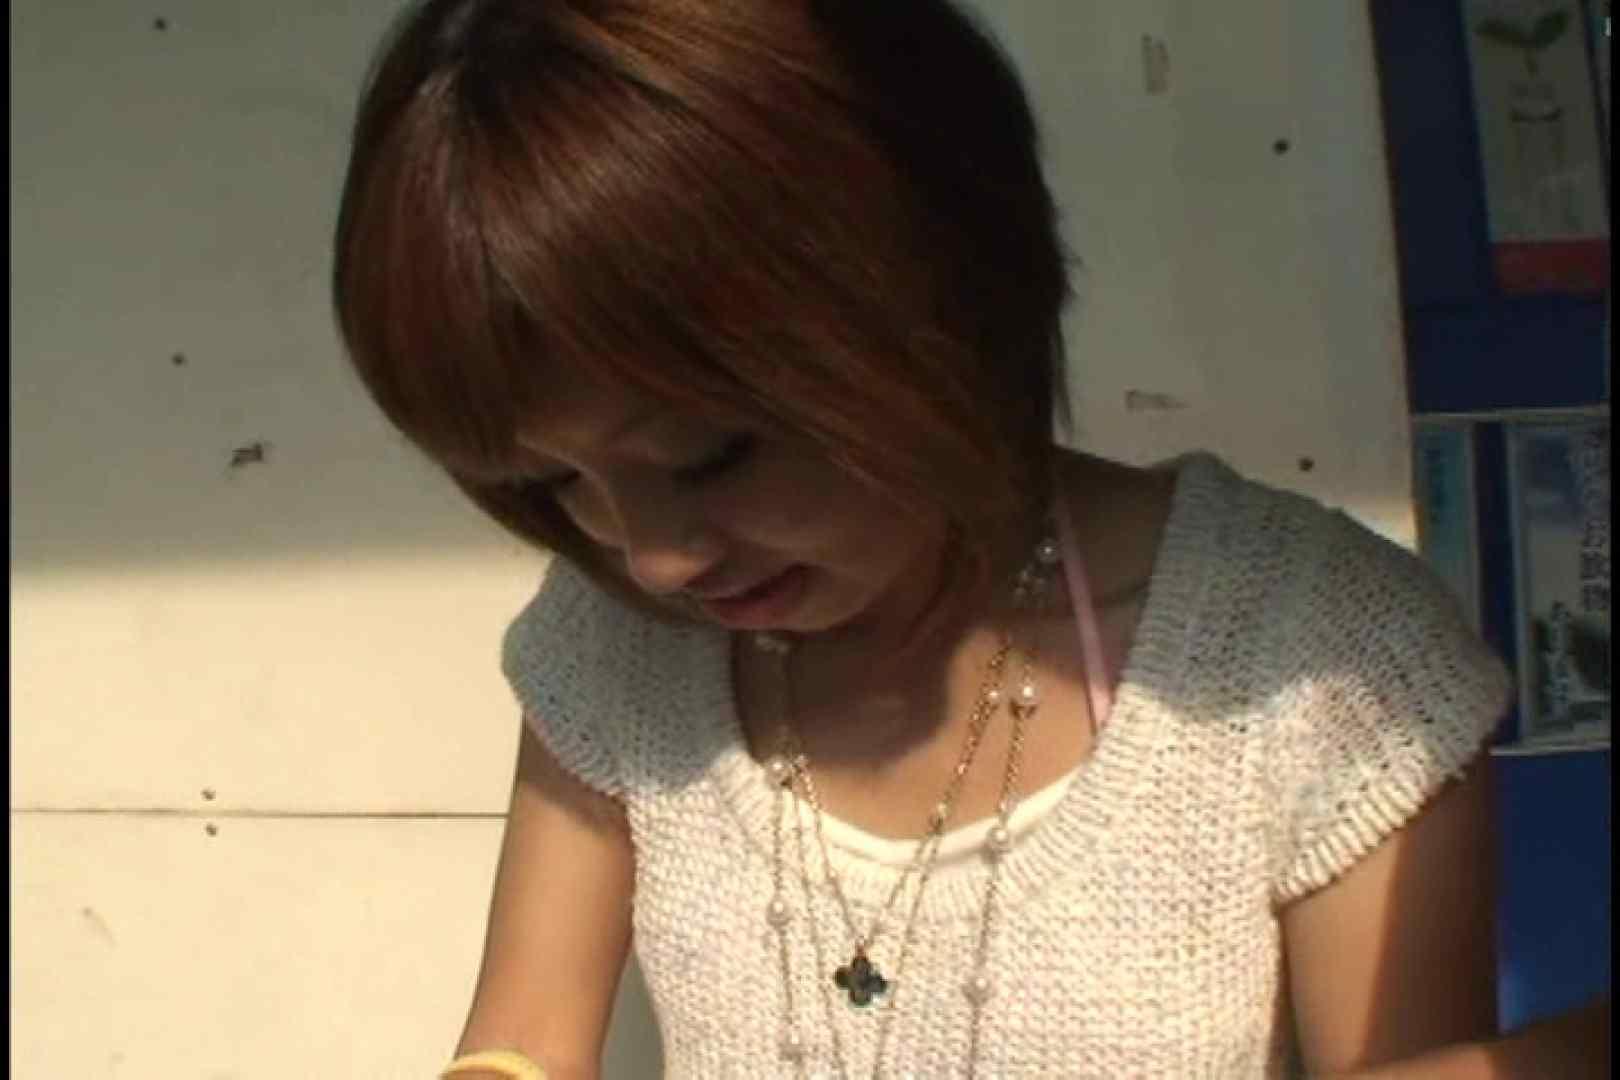 JDハンター全国ツアー vol.026 前編 女子大生のエロ動画 | 0  82PIX 1